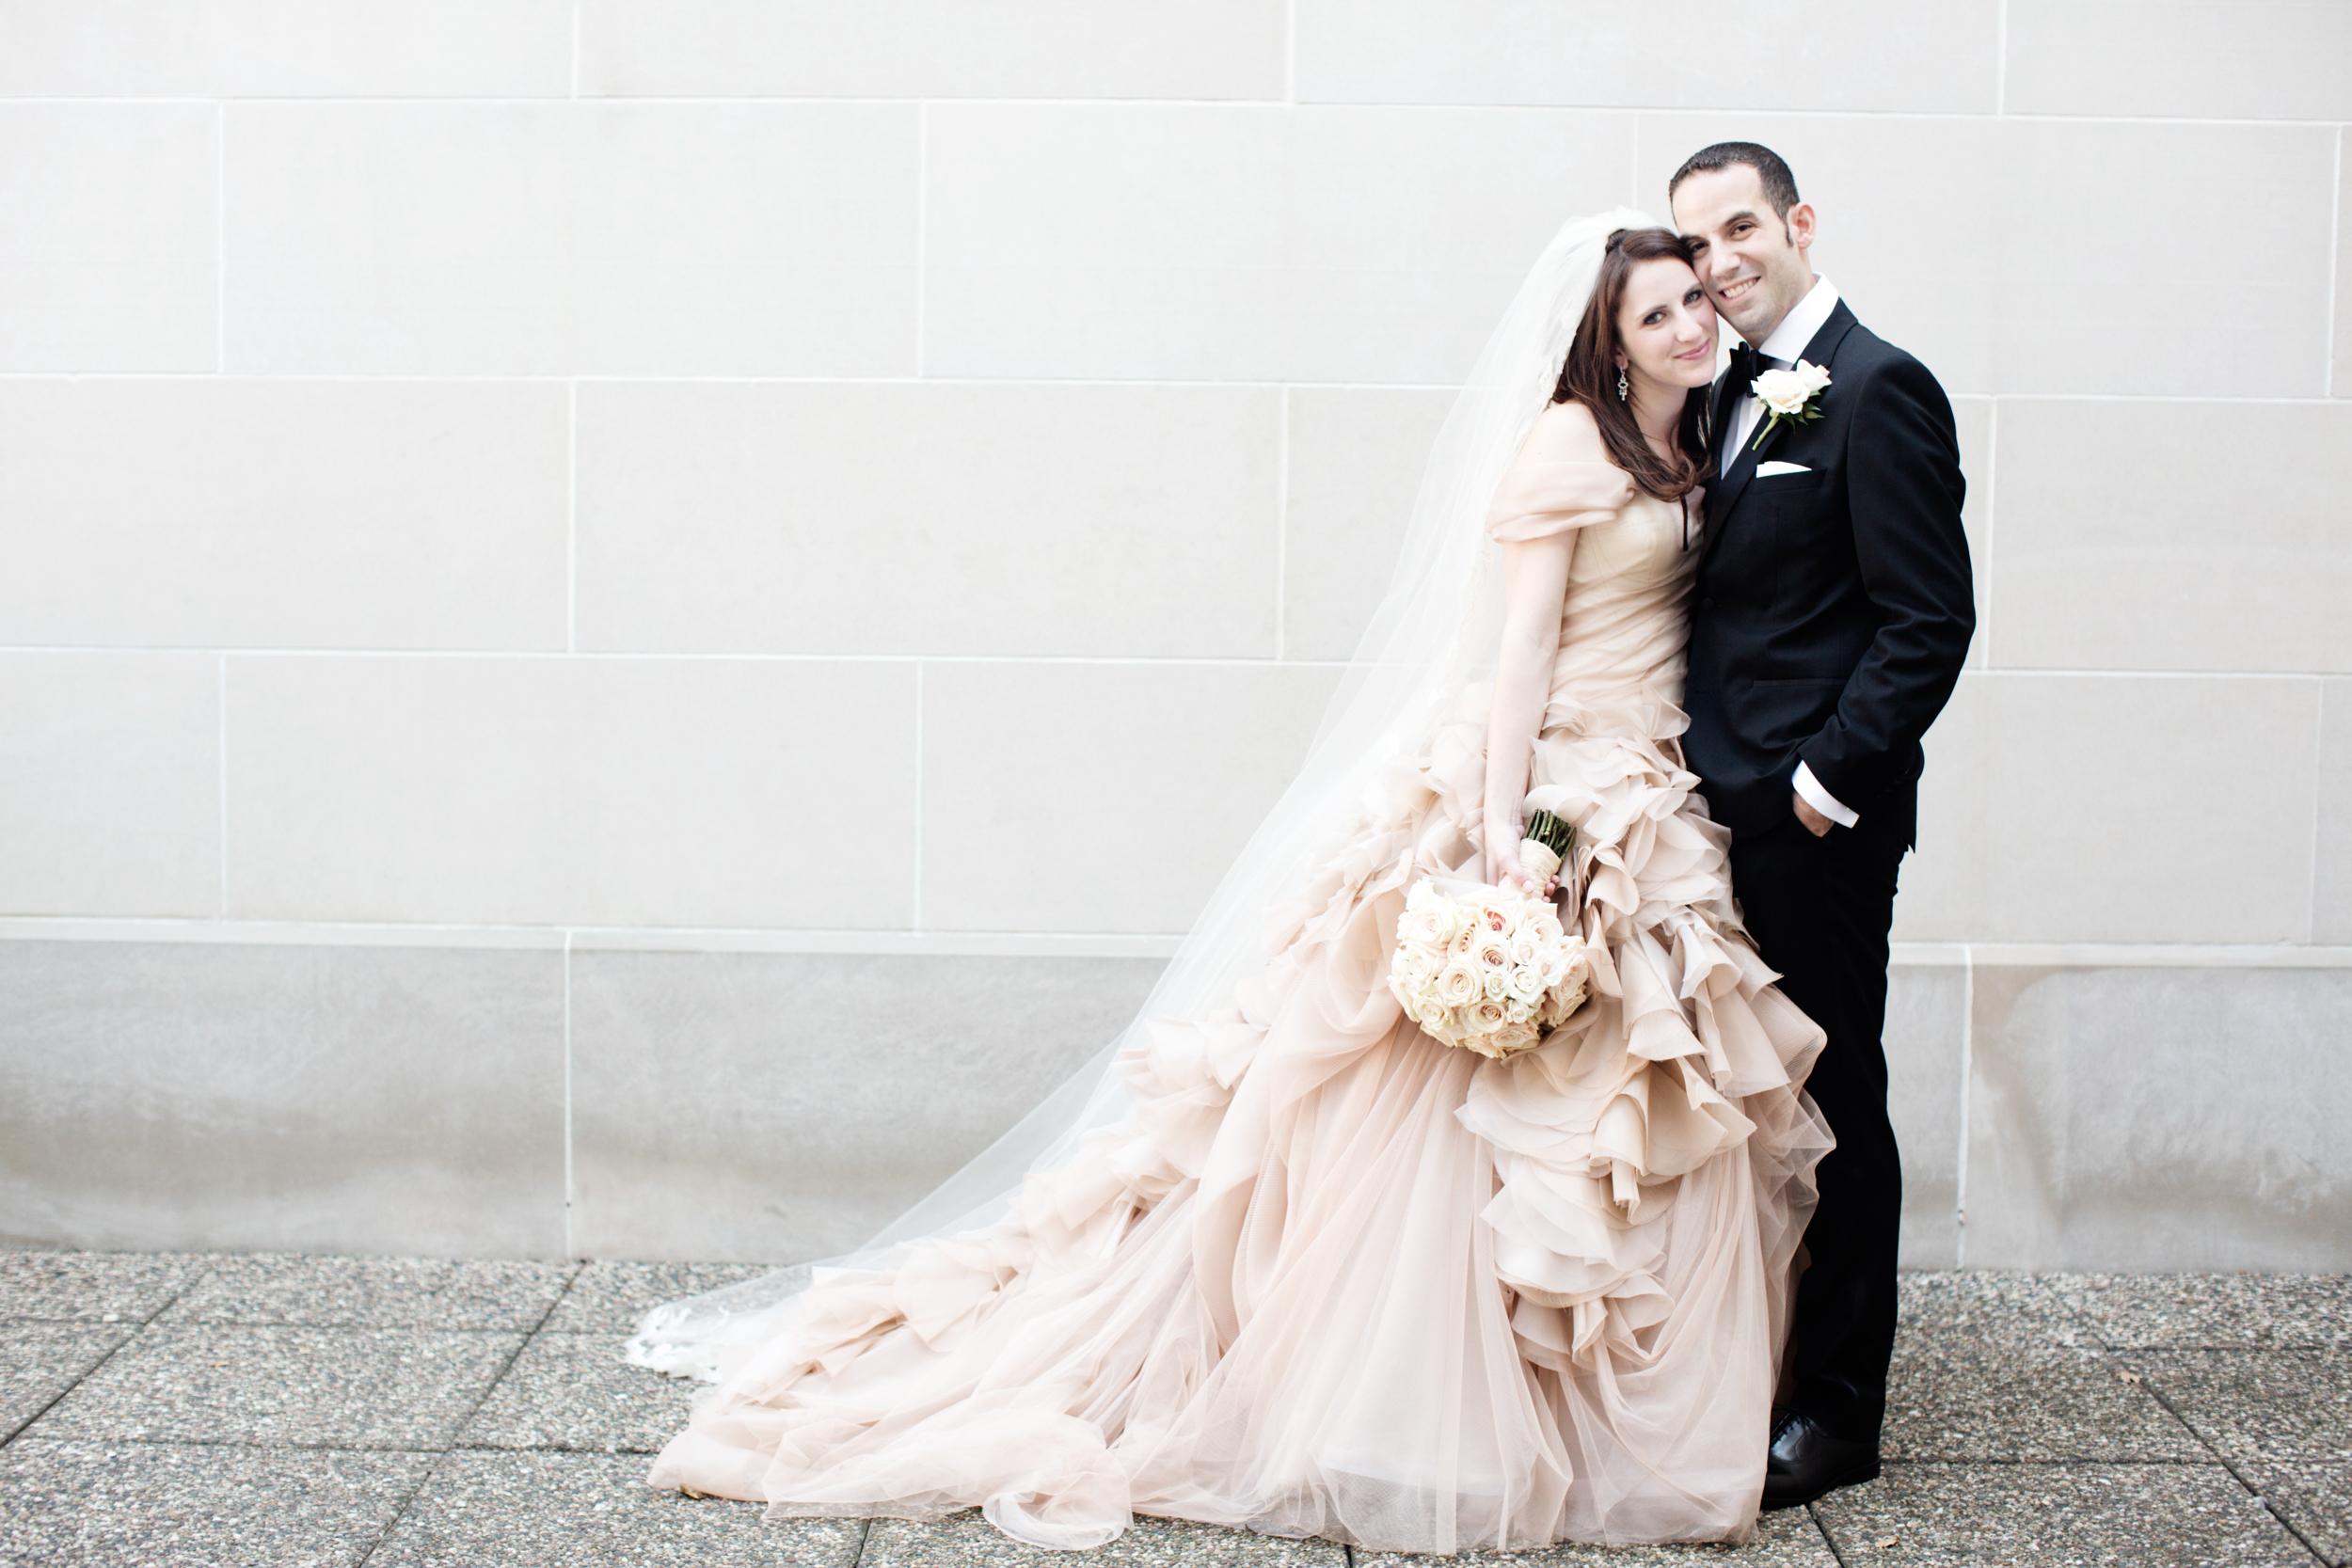 Ceci_New_York_Ceci_Style_Ceci_Johnson_Luxury_Lifestyle_Floral_Lace_Wedding_Letterpress_Inspiration_Design_Custom_Couture_Personalized_Invitations_.jpg